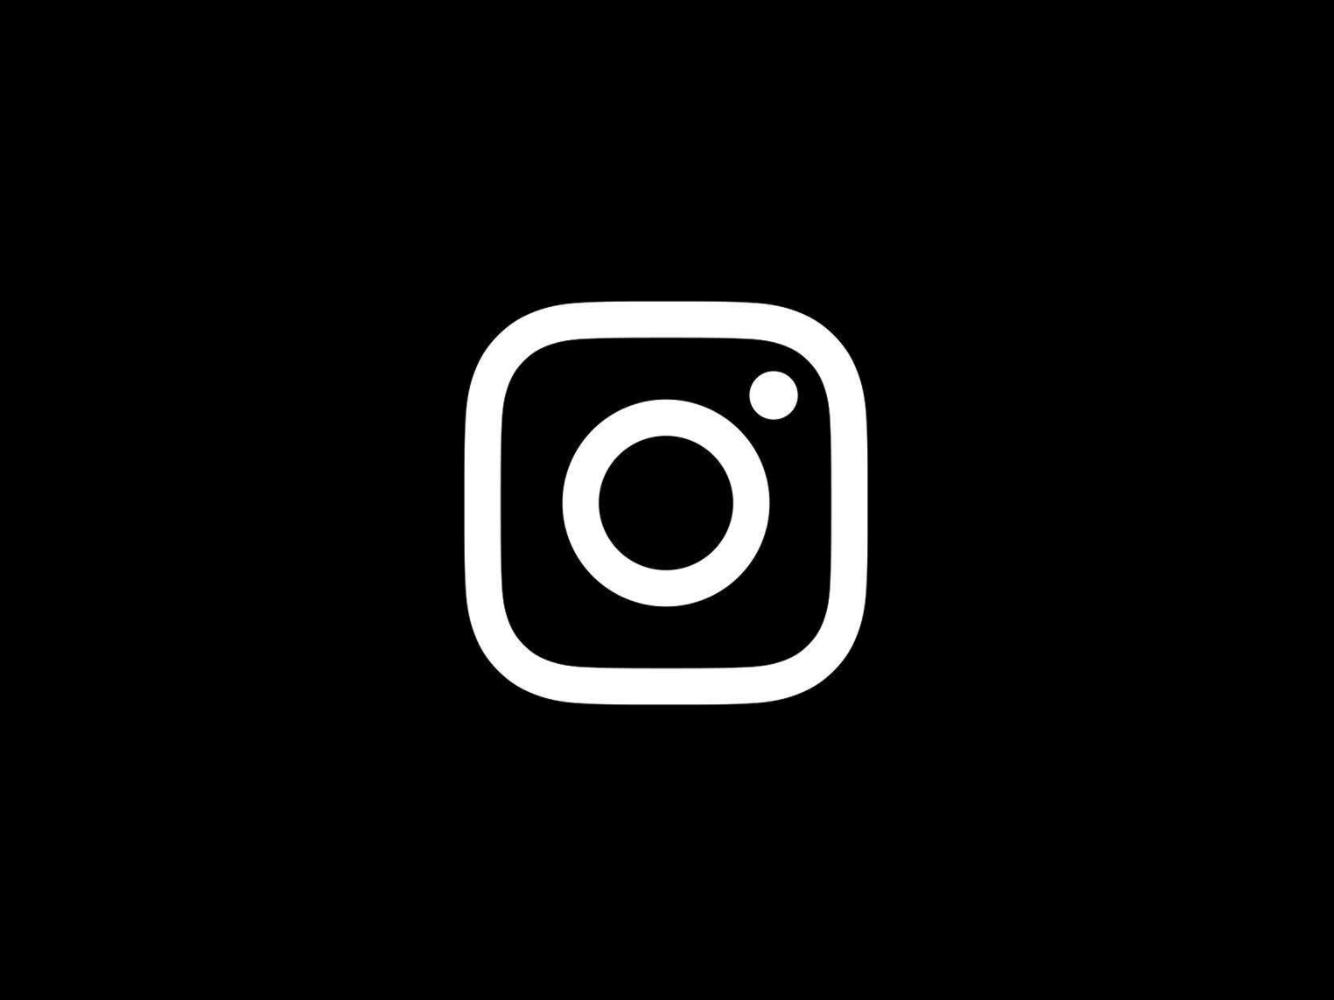 Instagram glyph on black background